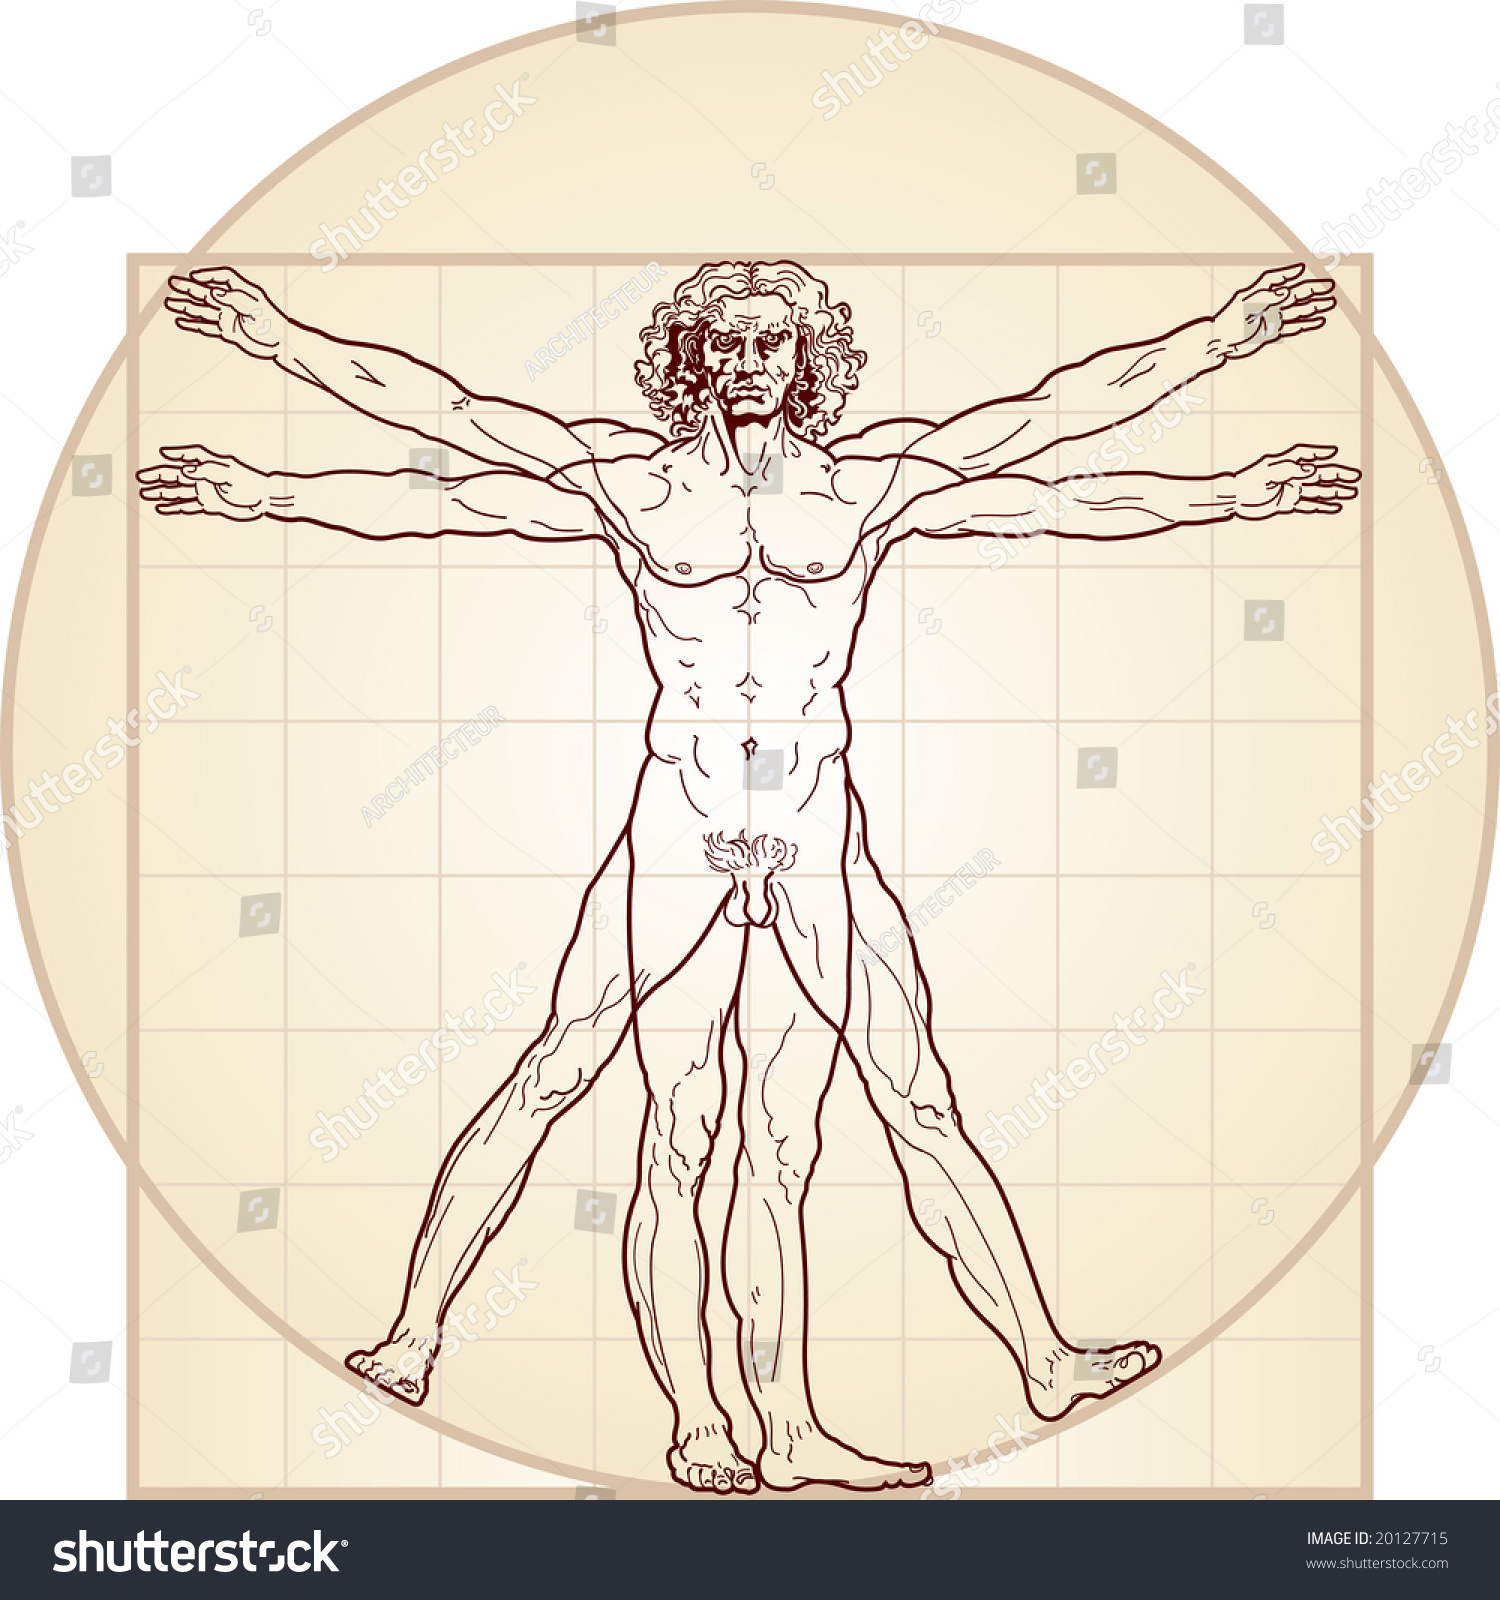 Vitruvian Man Detailed Drawing On Basis Stock Vector (Royalty Free ...